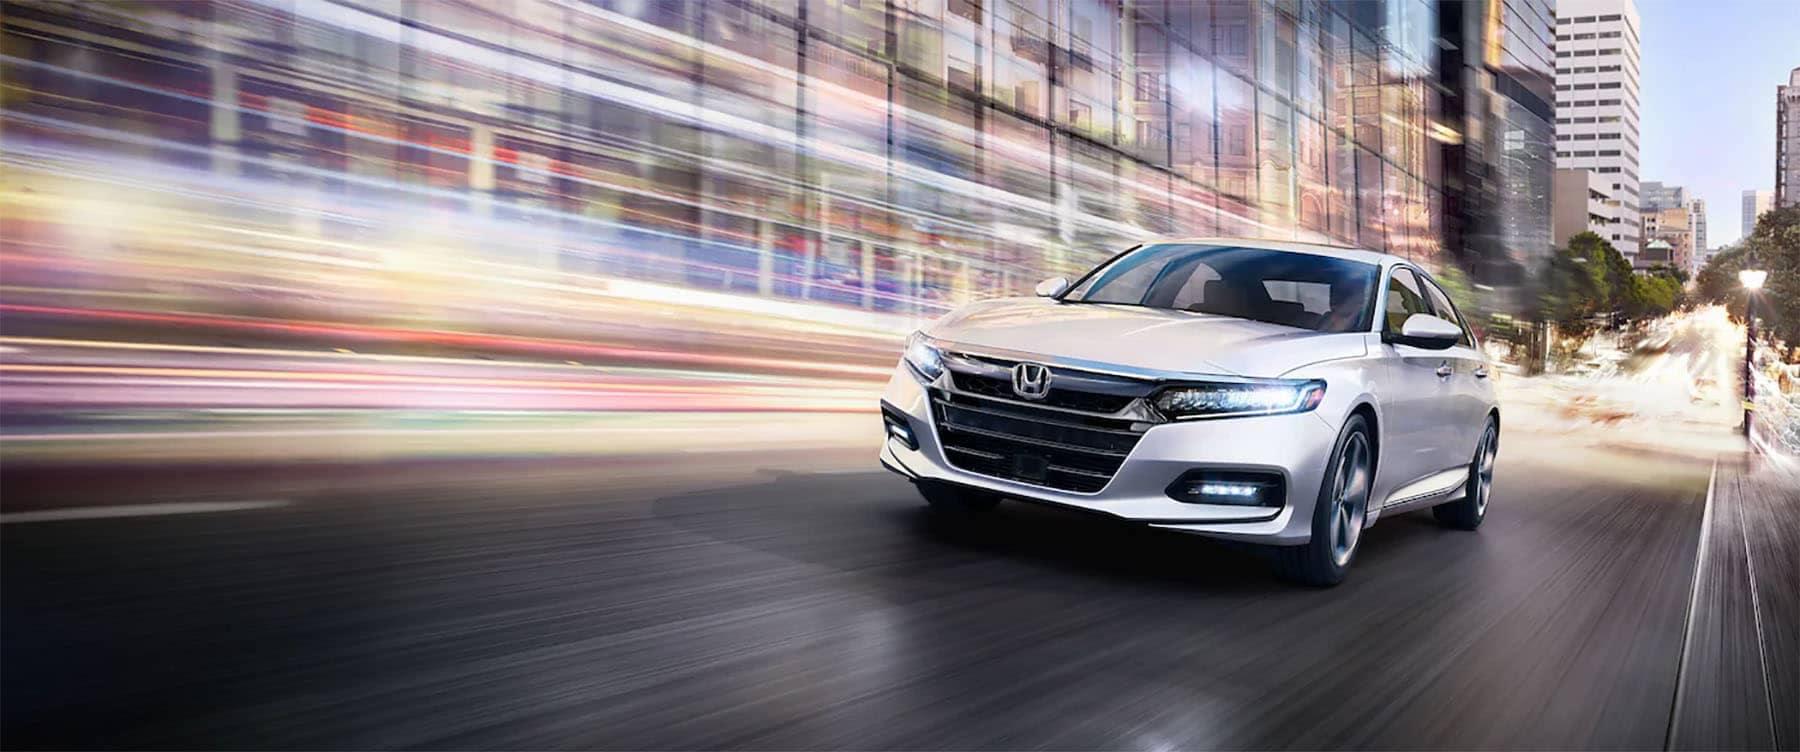 2019-Honda-Accord-Driving-Through-the-City-Banner-111518.jpg